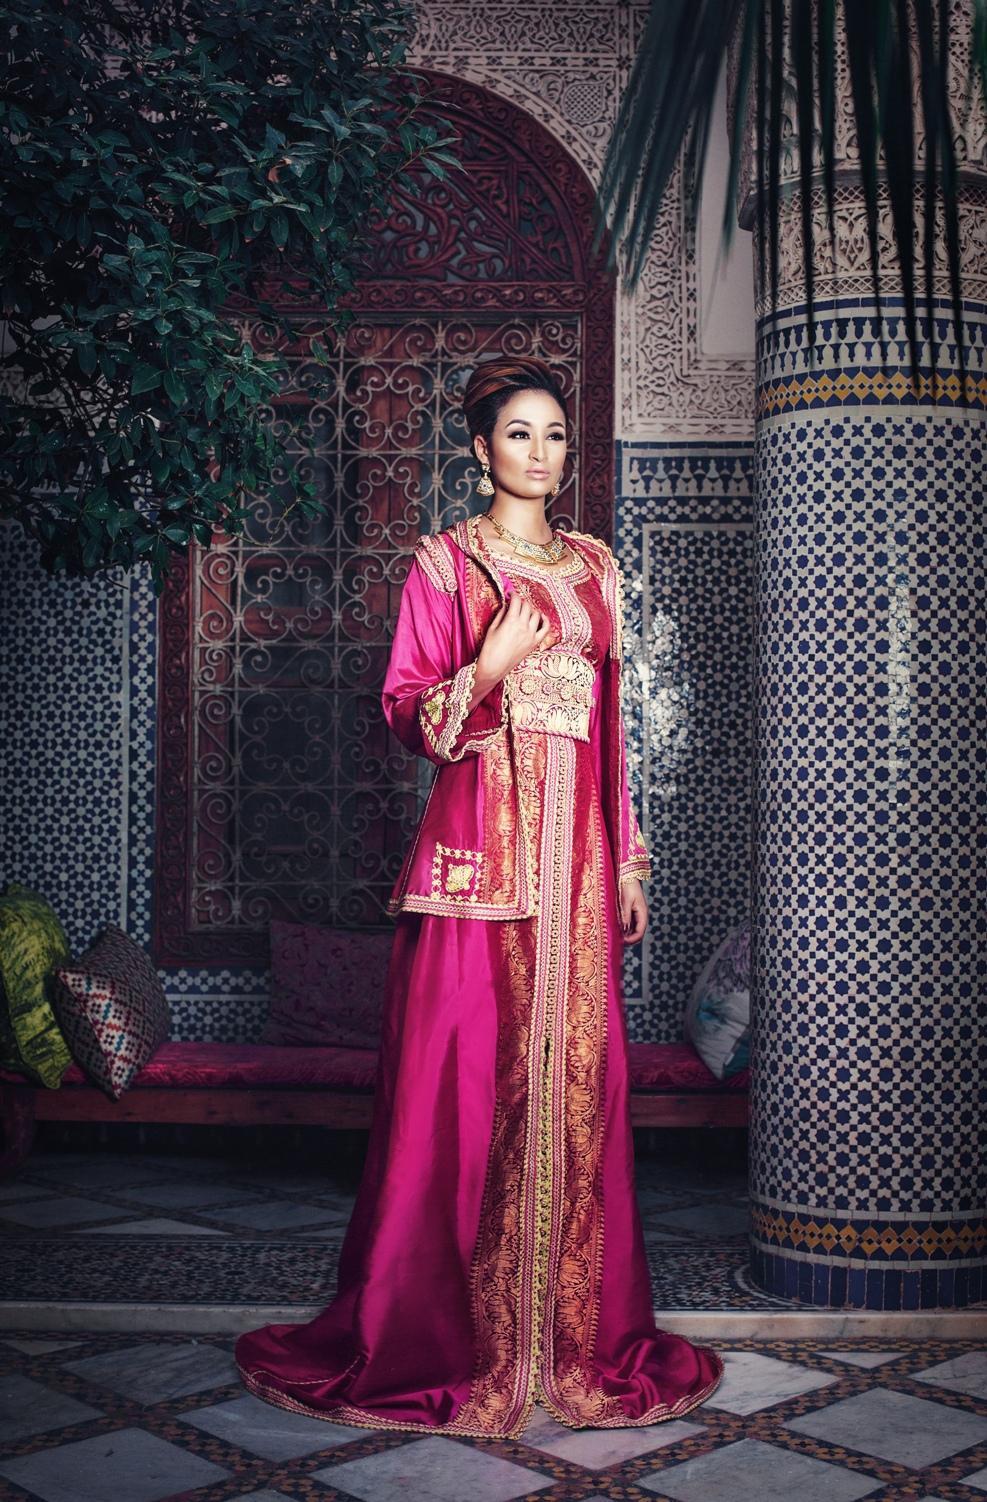 Intalnire cu femeile marocane